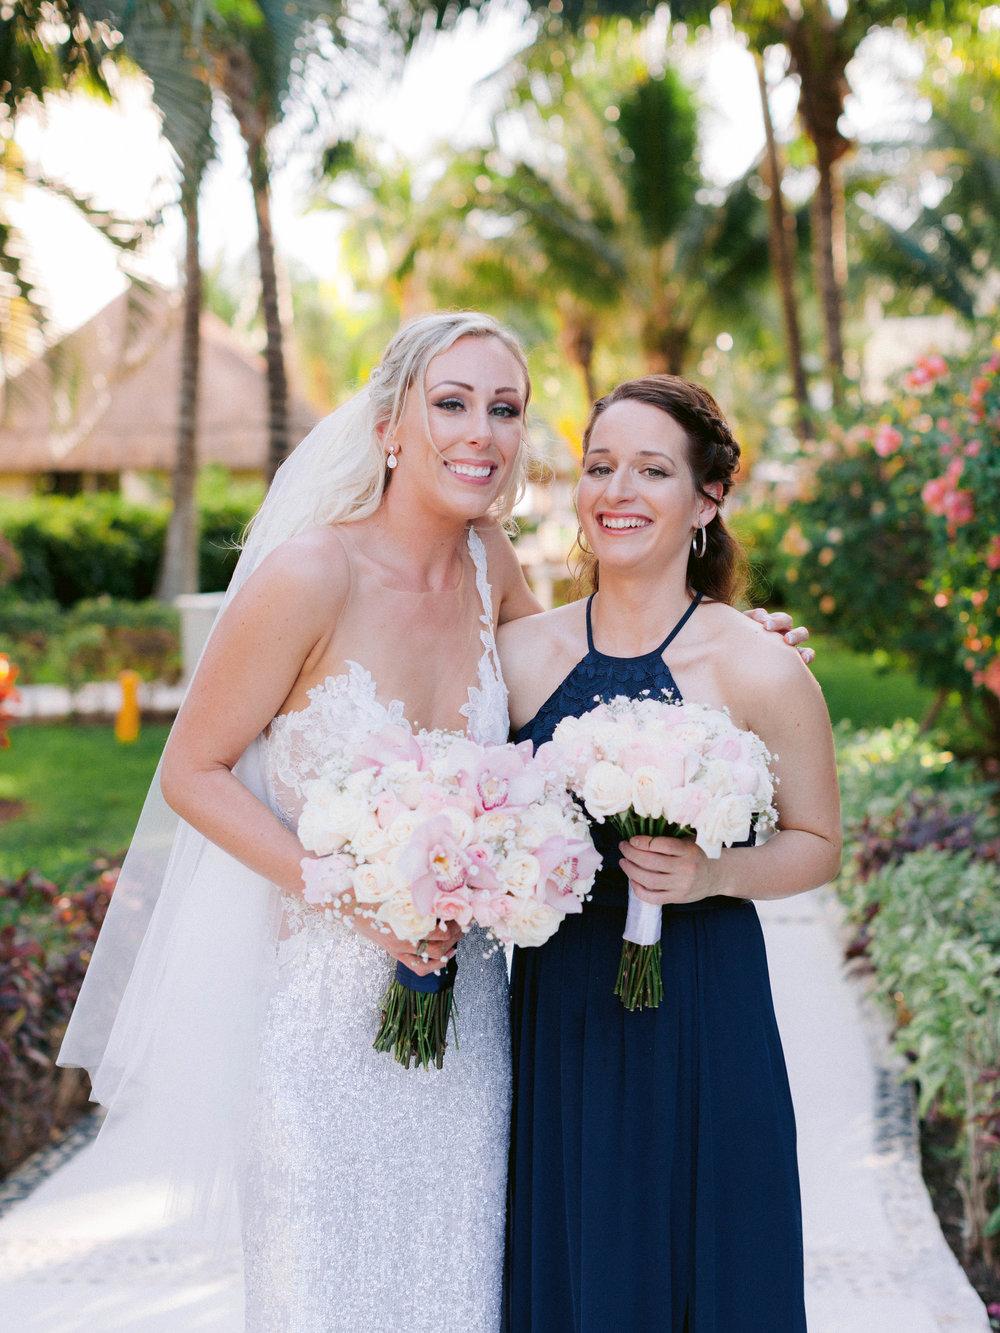 Kim_Jeff_Cancun Wedding_Portraits_Kurtz_Orpia (49 of 178).jpg